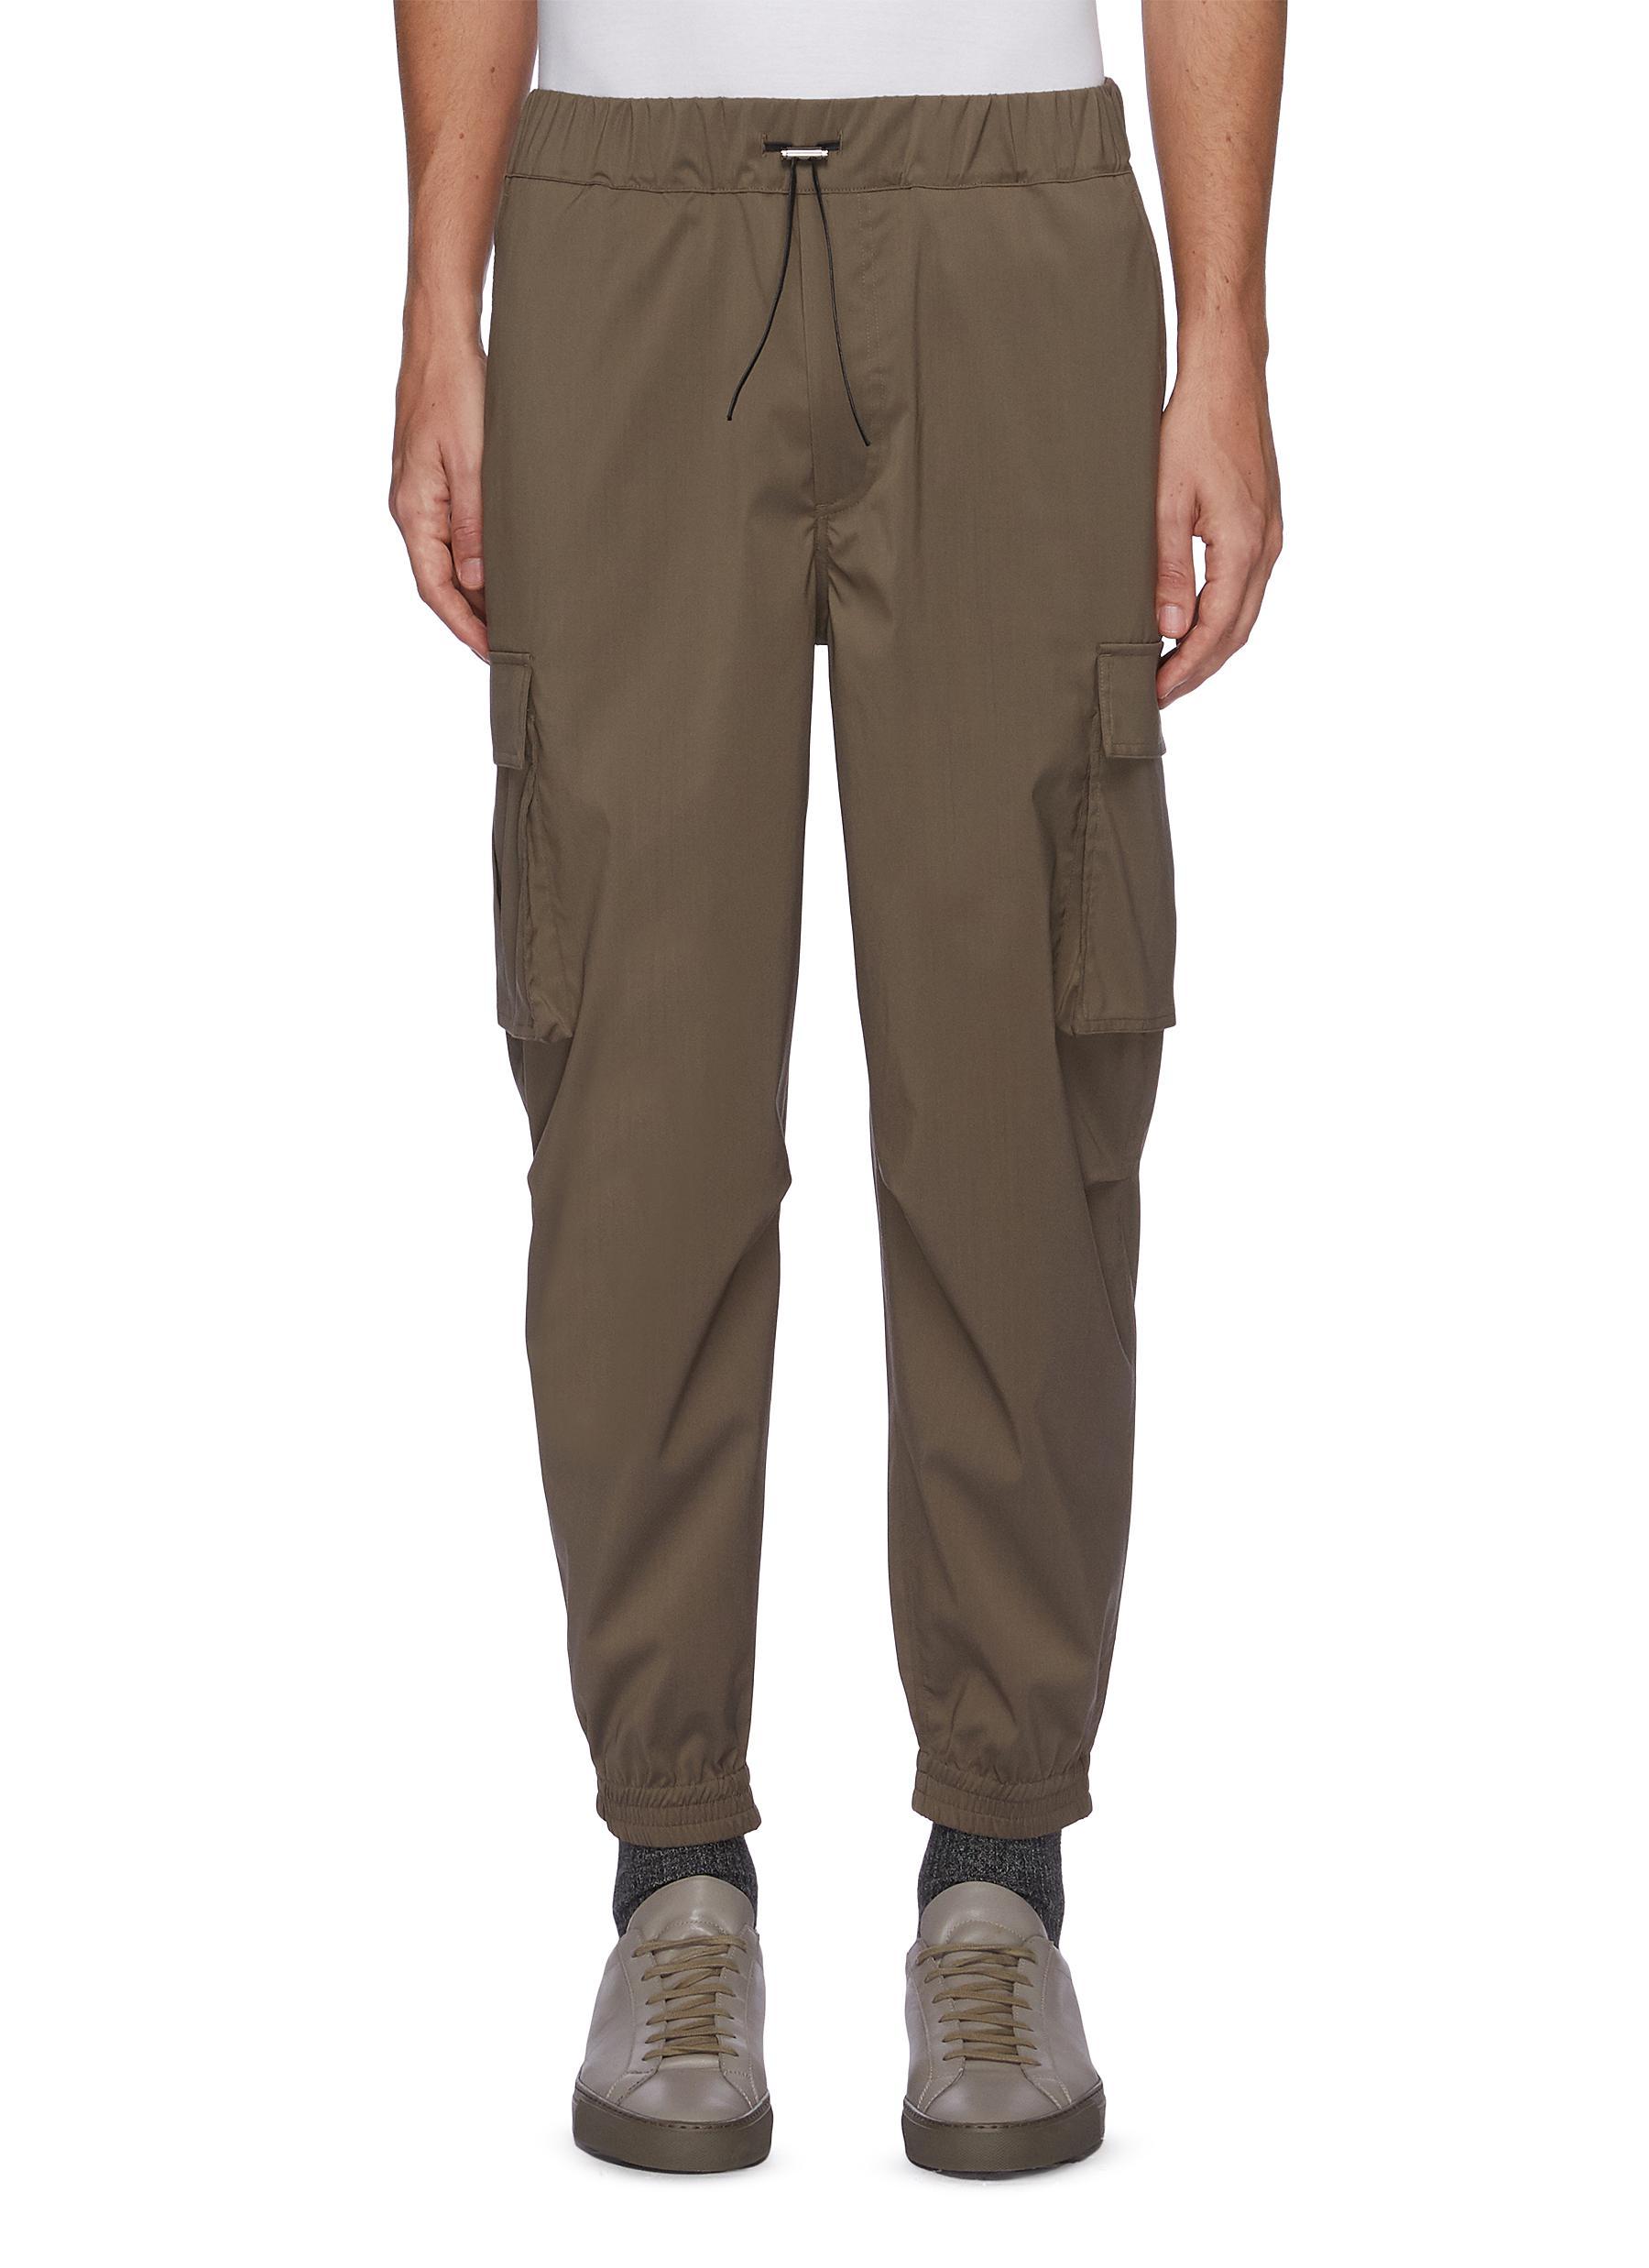 Drawcord Waist Cargo Pocket Crop Sweatpants